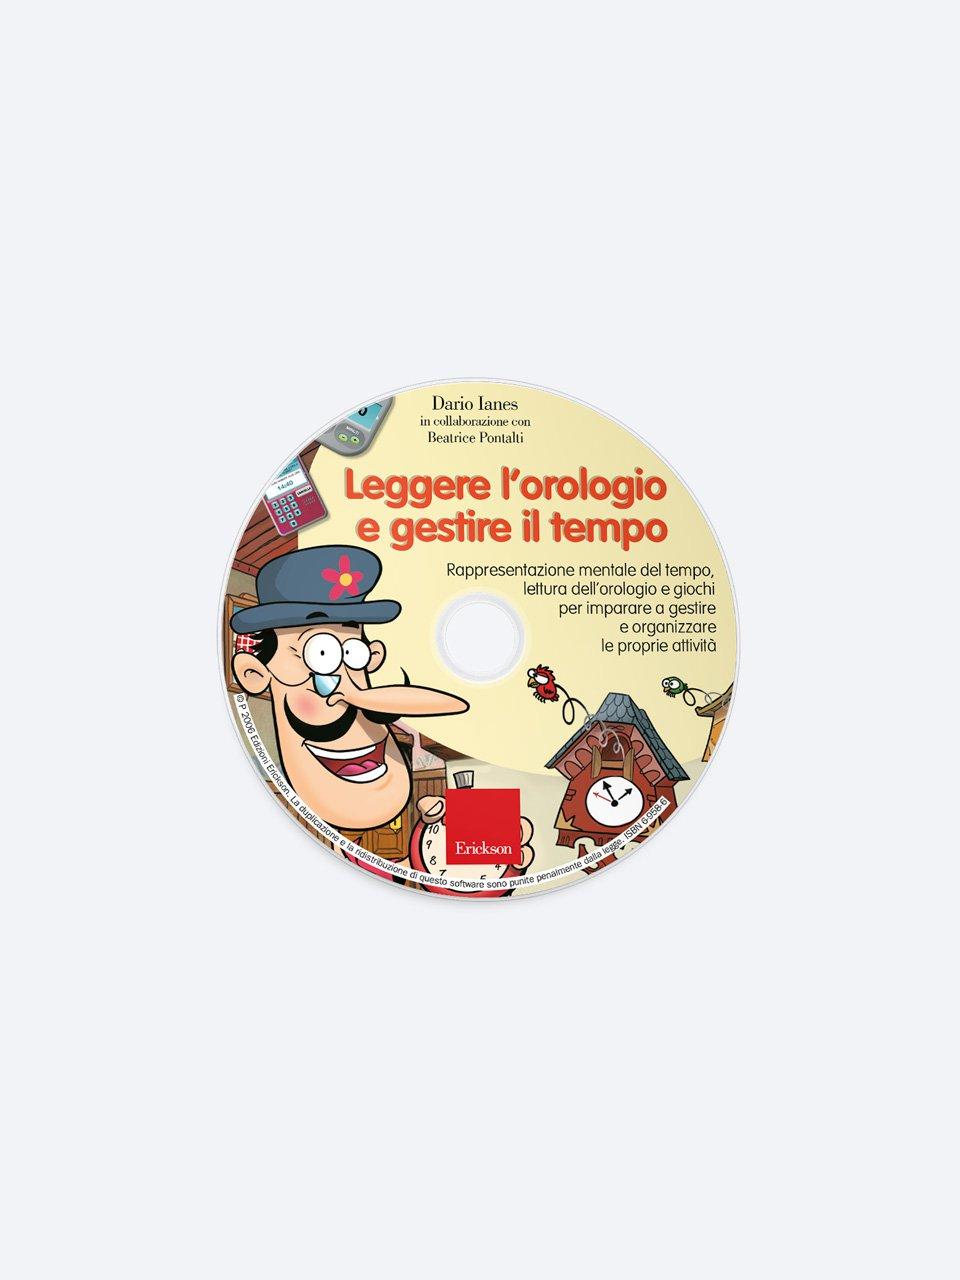 Imparo a... leggere l'orologio - Dario Ianes - Erickson 3